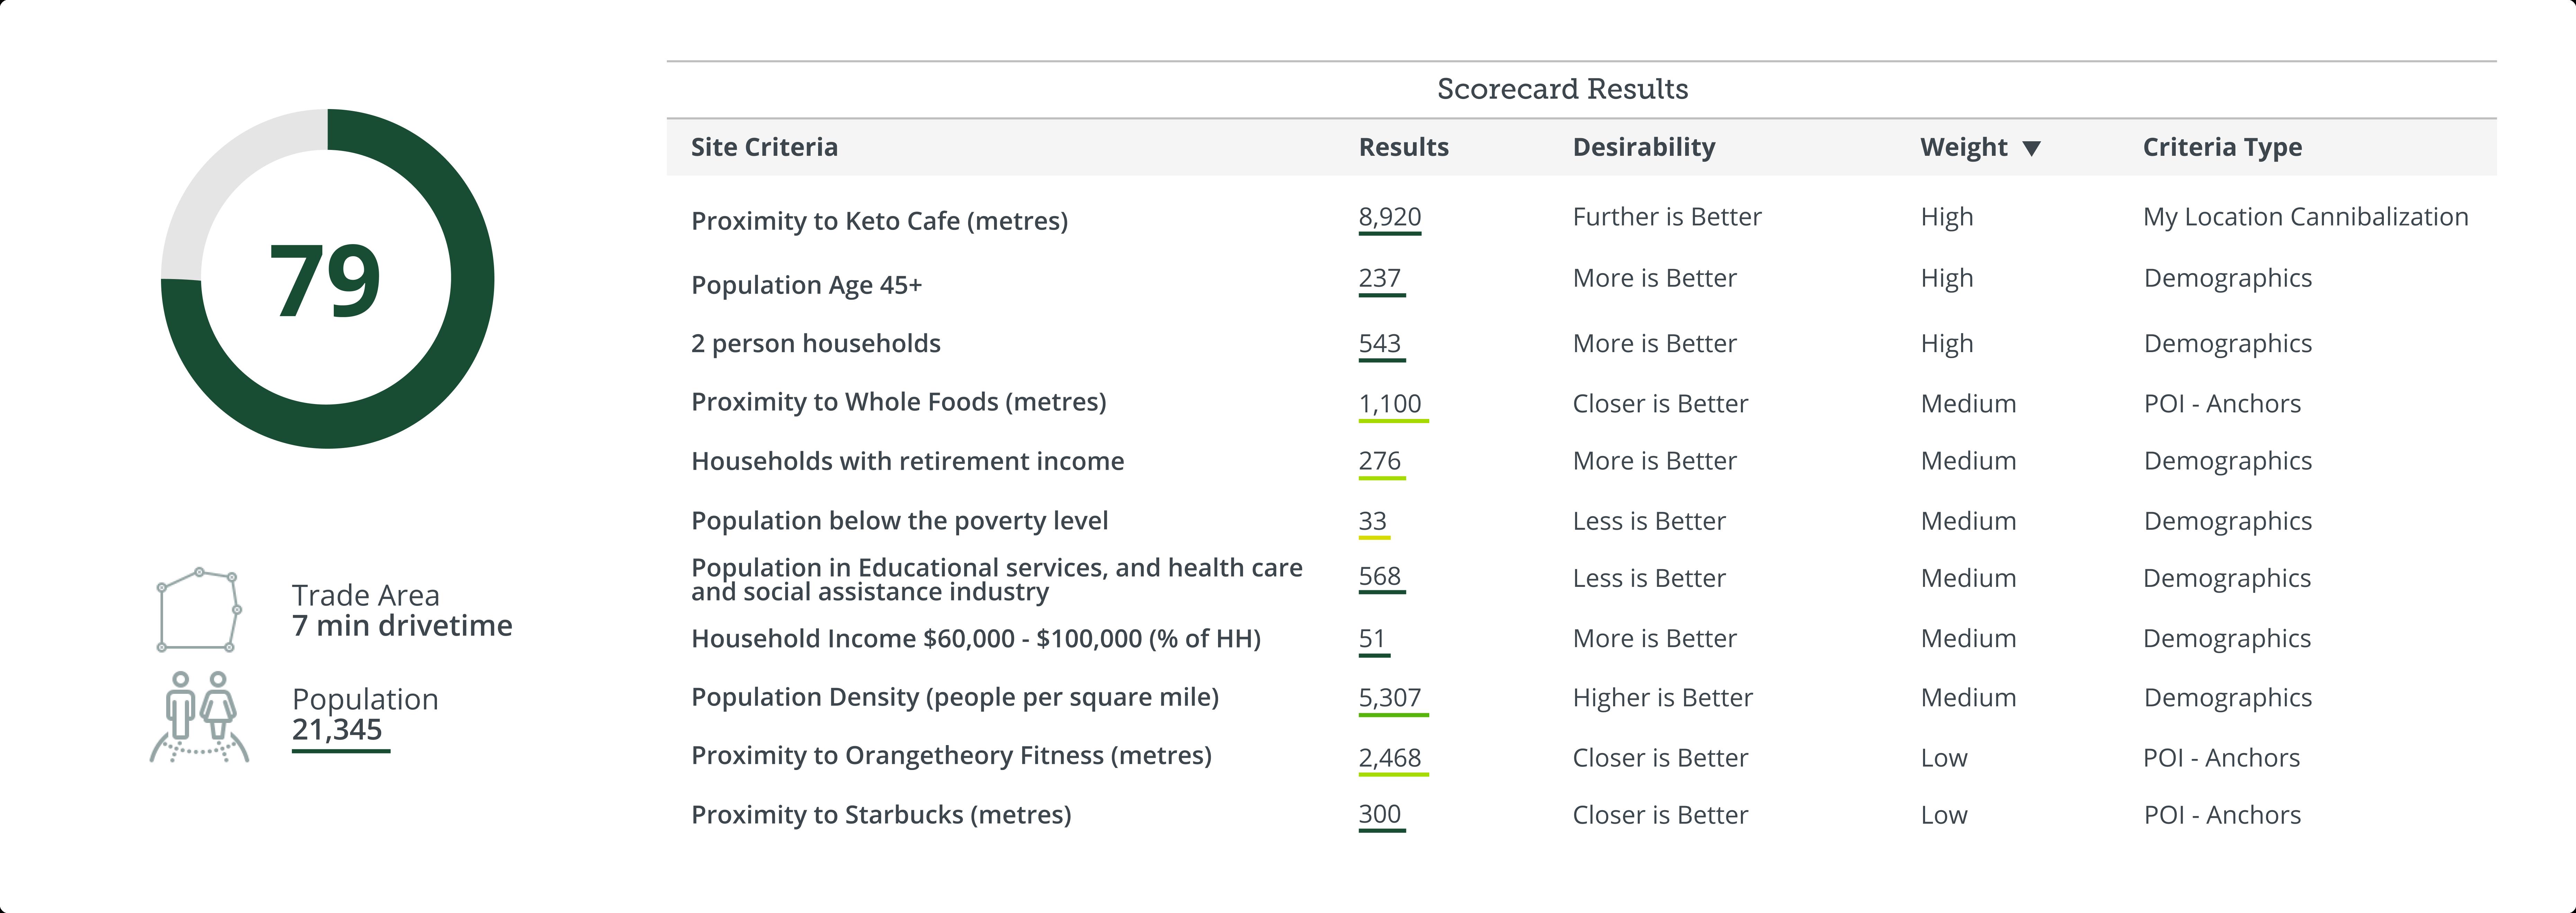 Marketmatch scorecard integration in PiinPoint reports